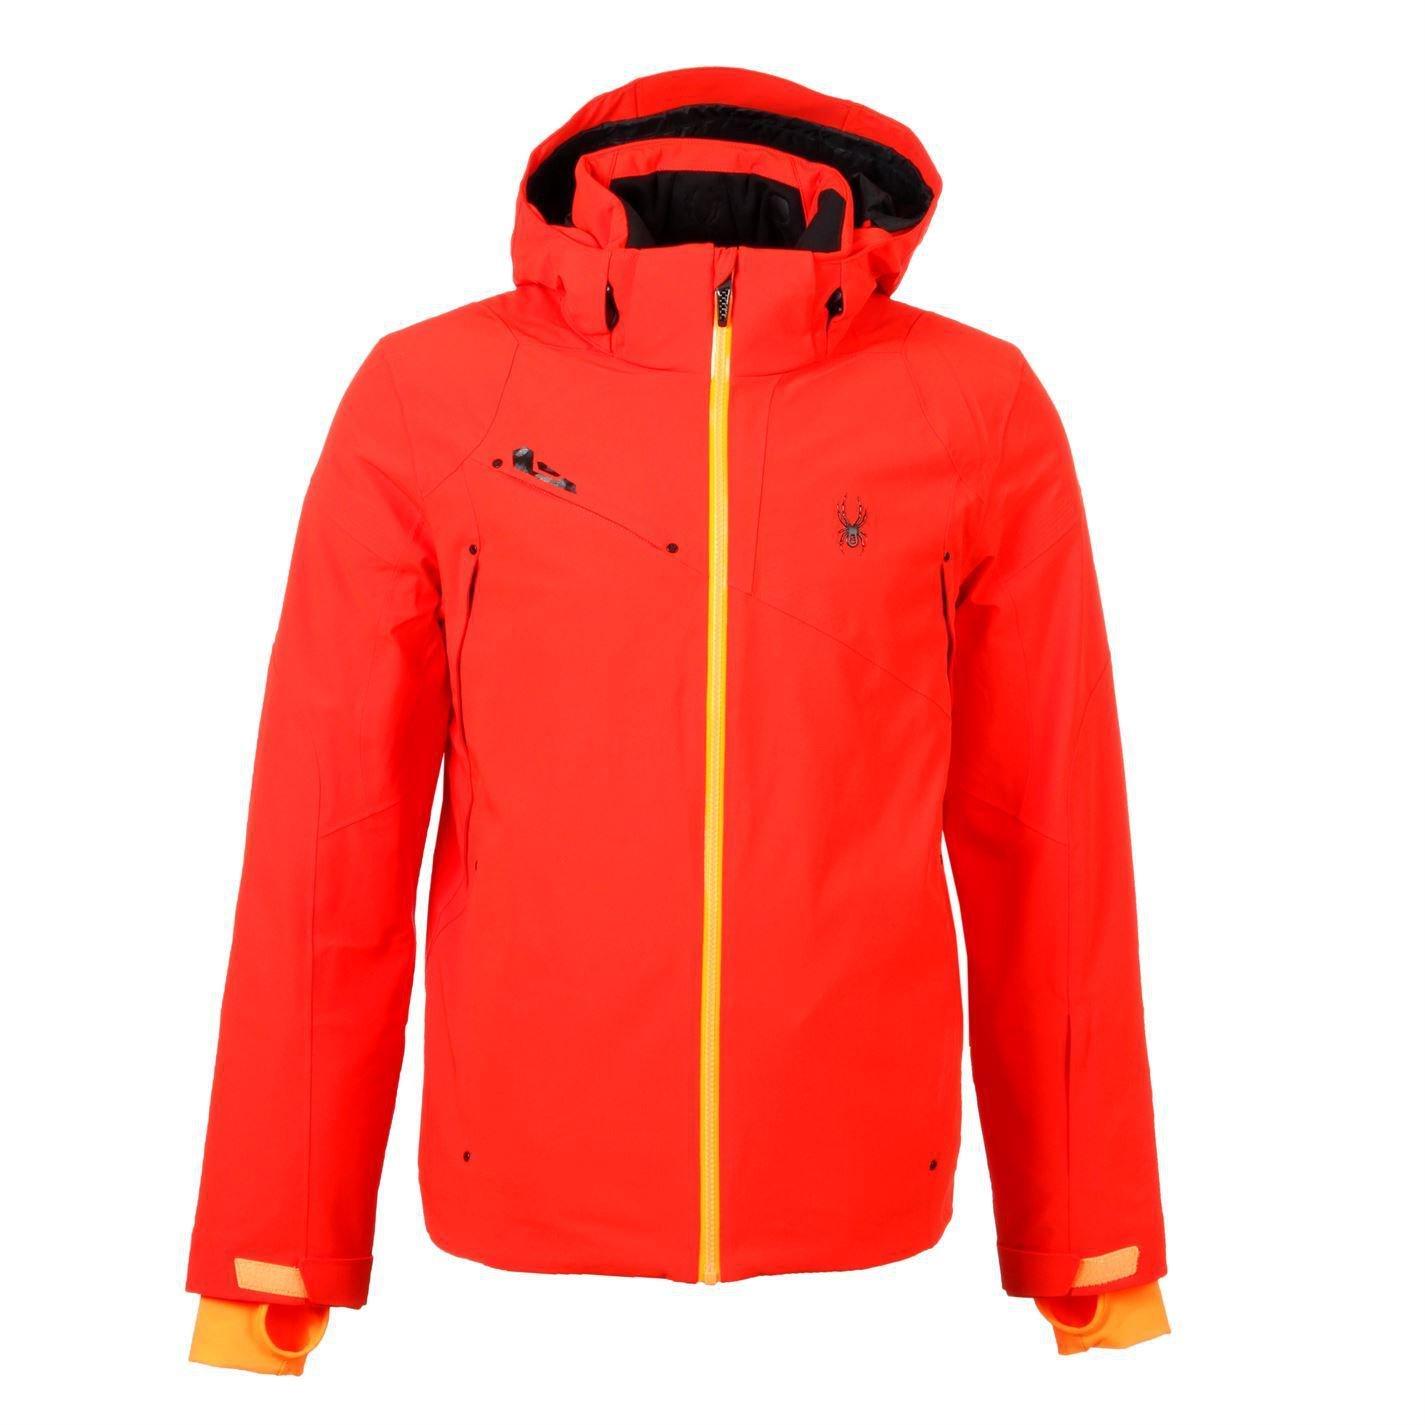 Spyder Mens Alyeska Jacket Long Sleeve Coat Top Ski Snowboarding Sports